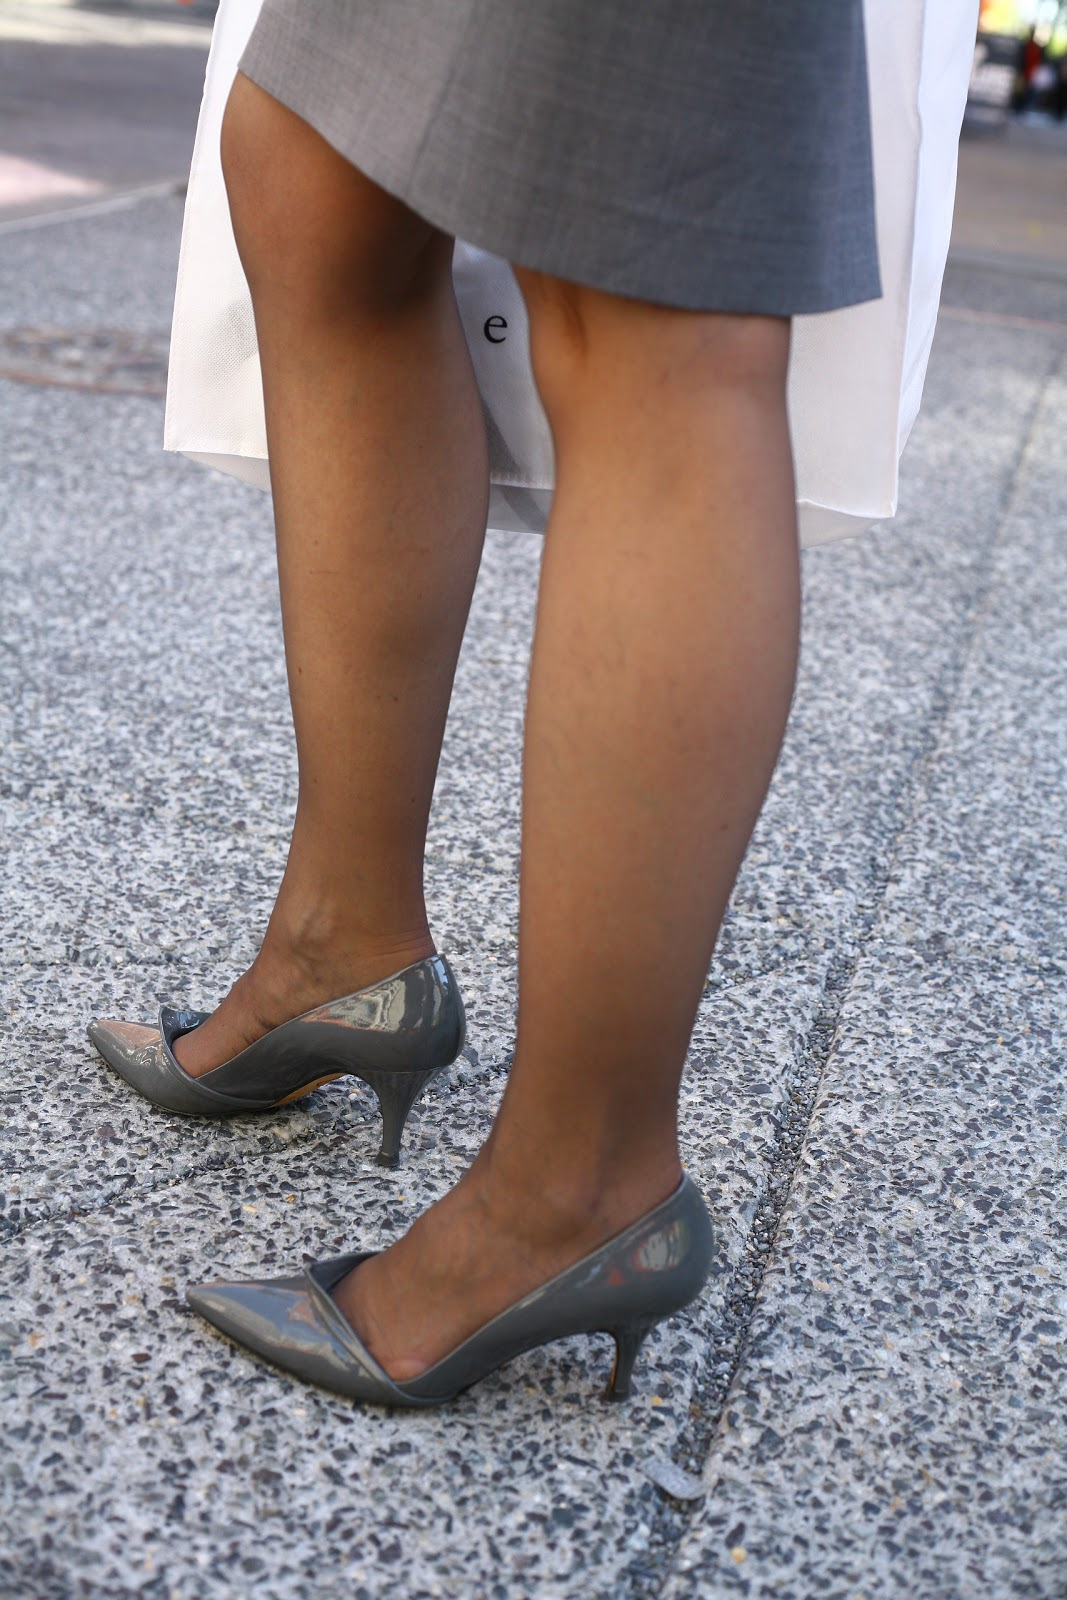 Street Gazing: Street Gazing Nylons and fancy heels.